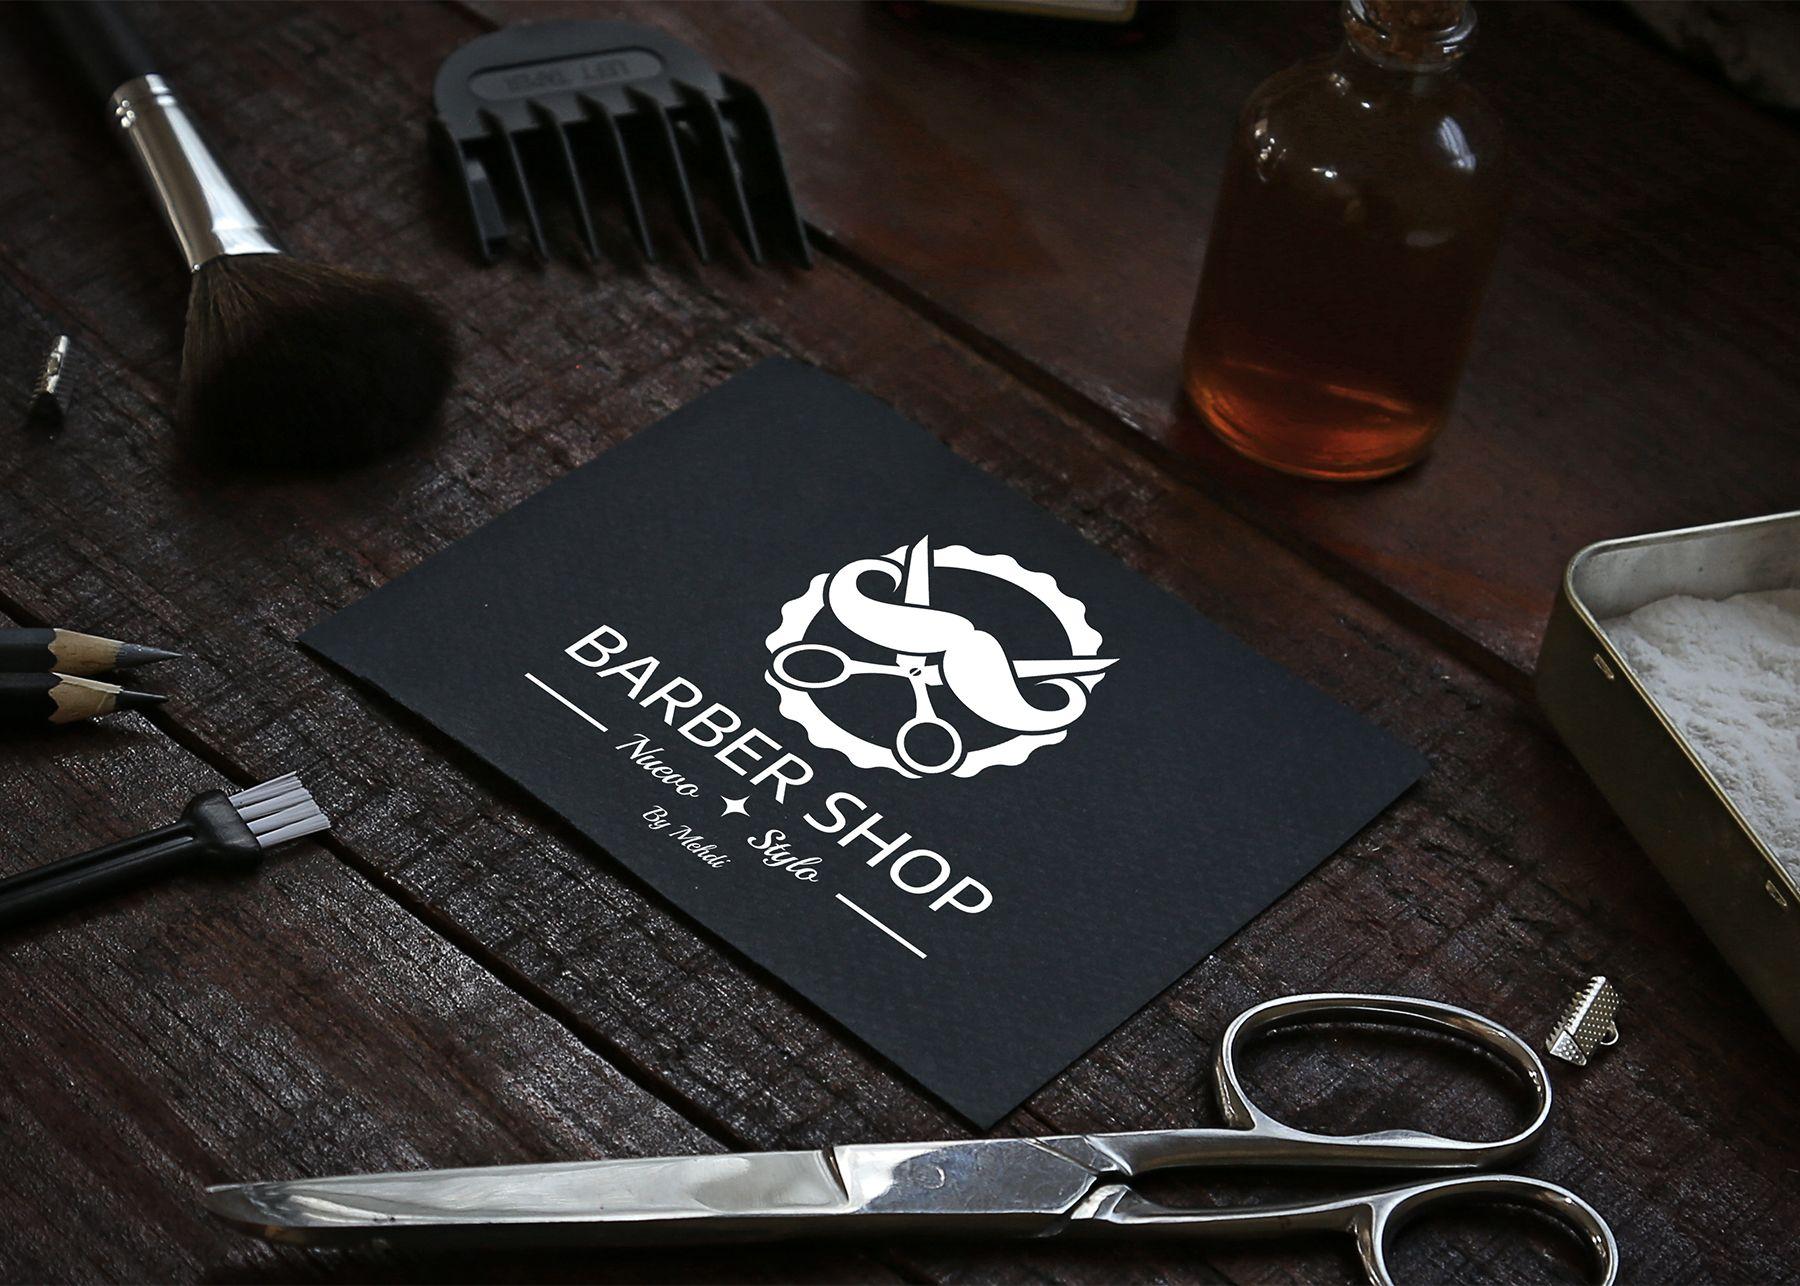 BarbershopNuevostylo